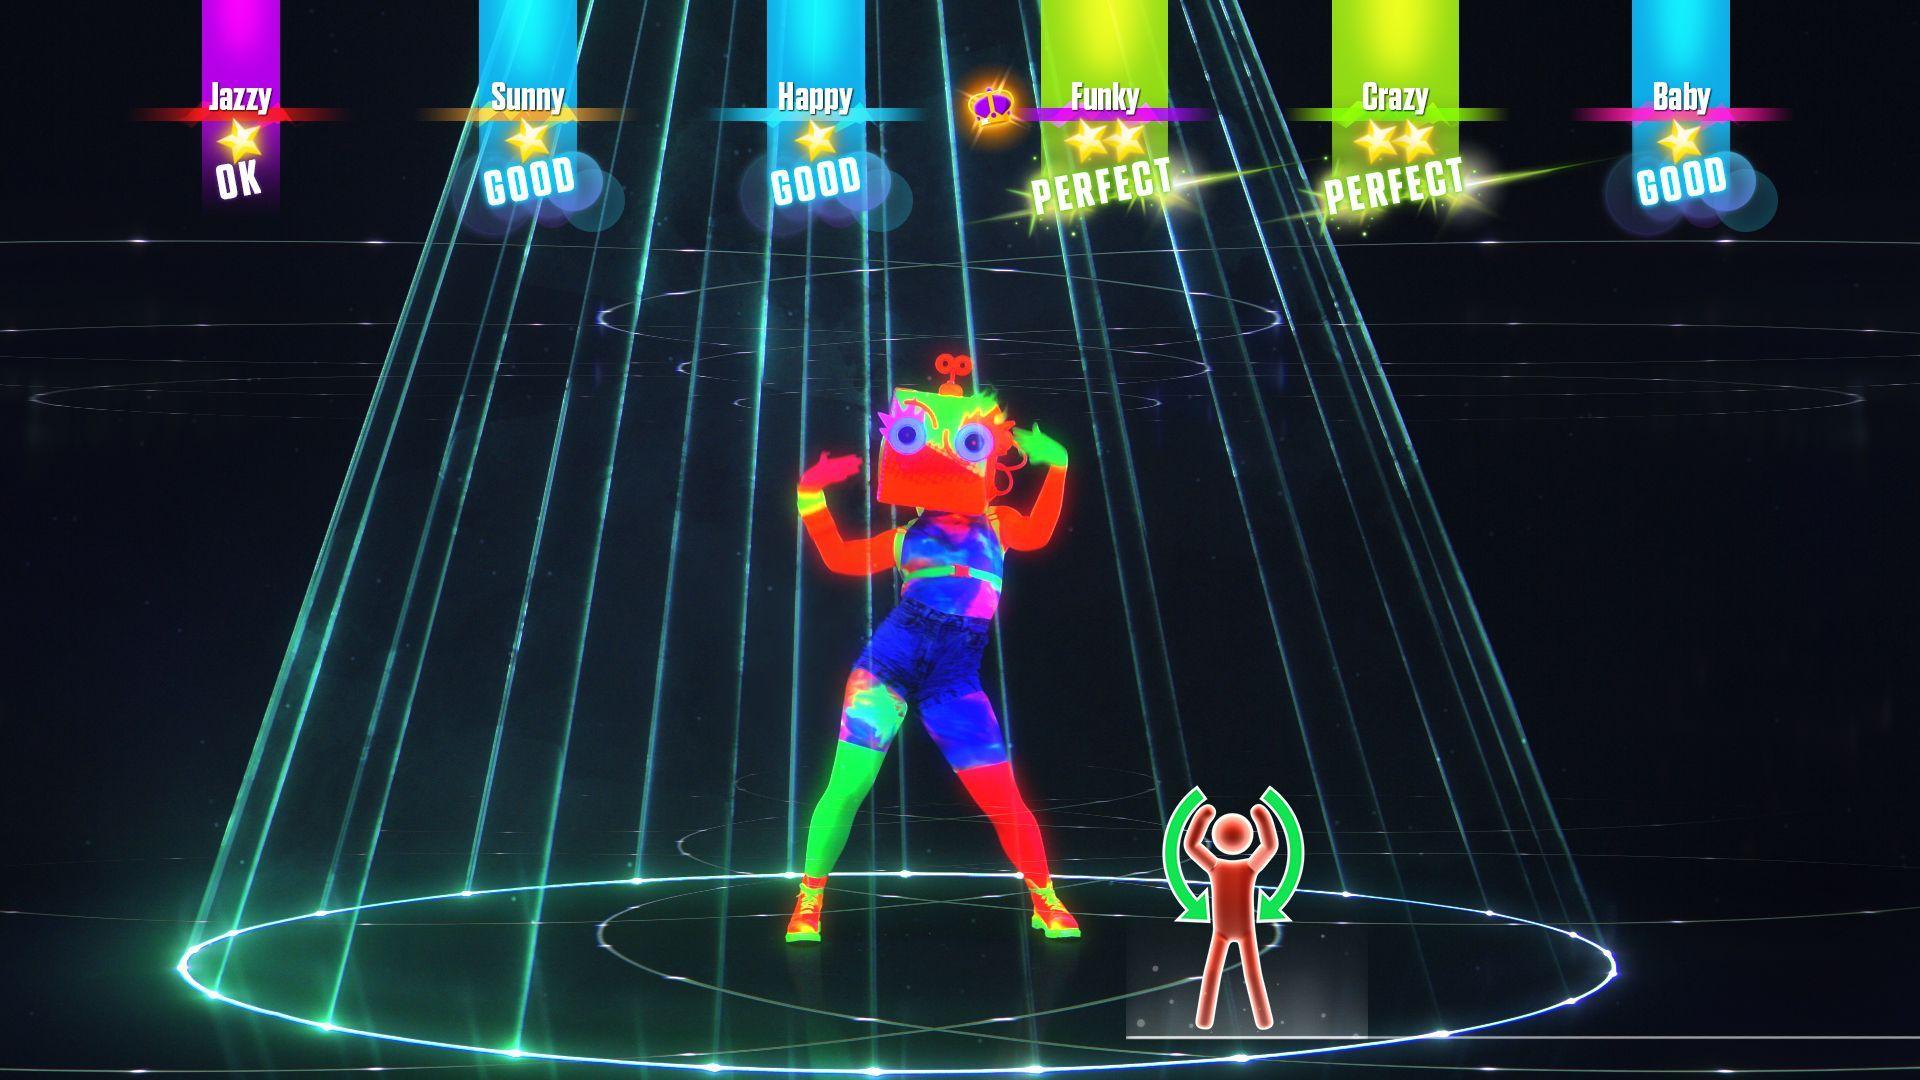 Just Dance 2017 (Nintendo Switch) - 8